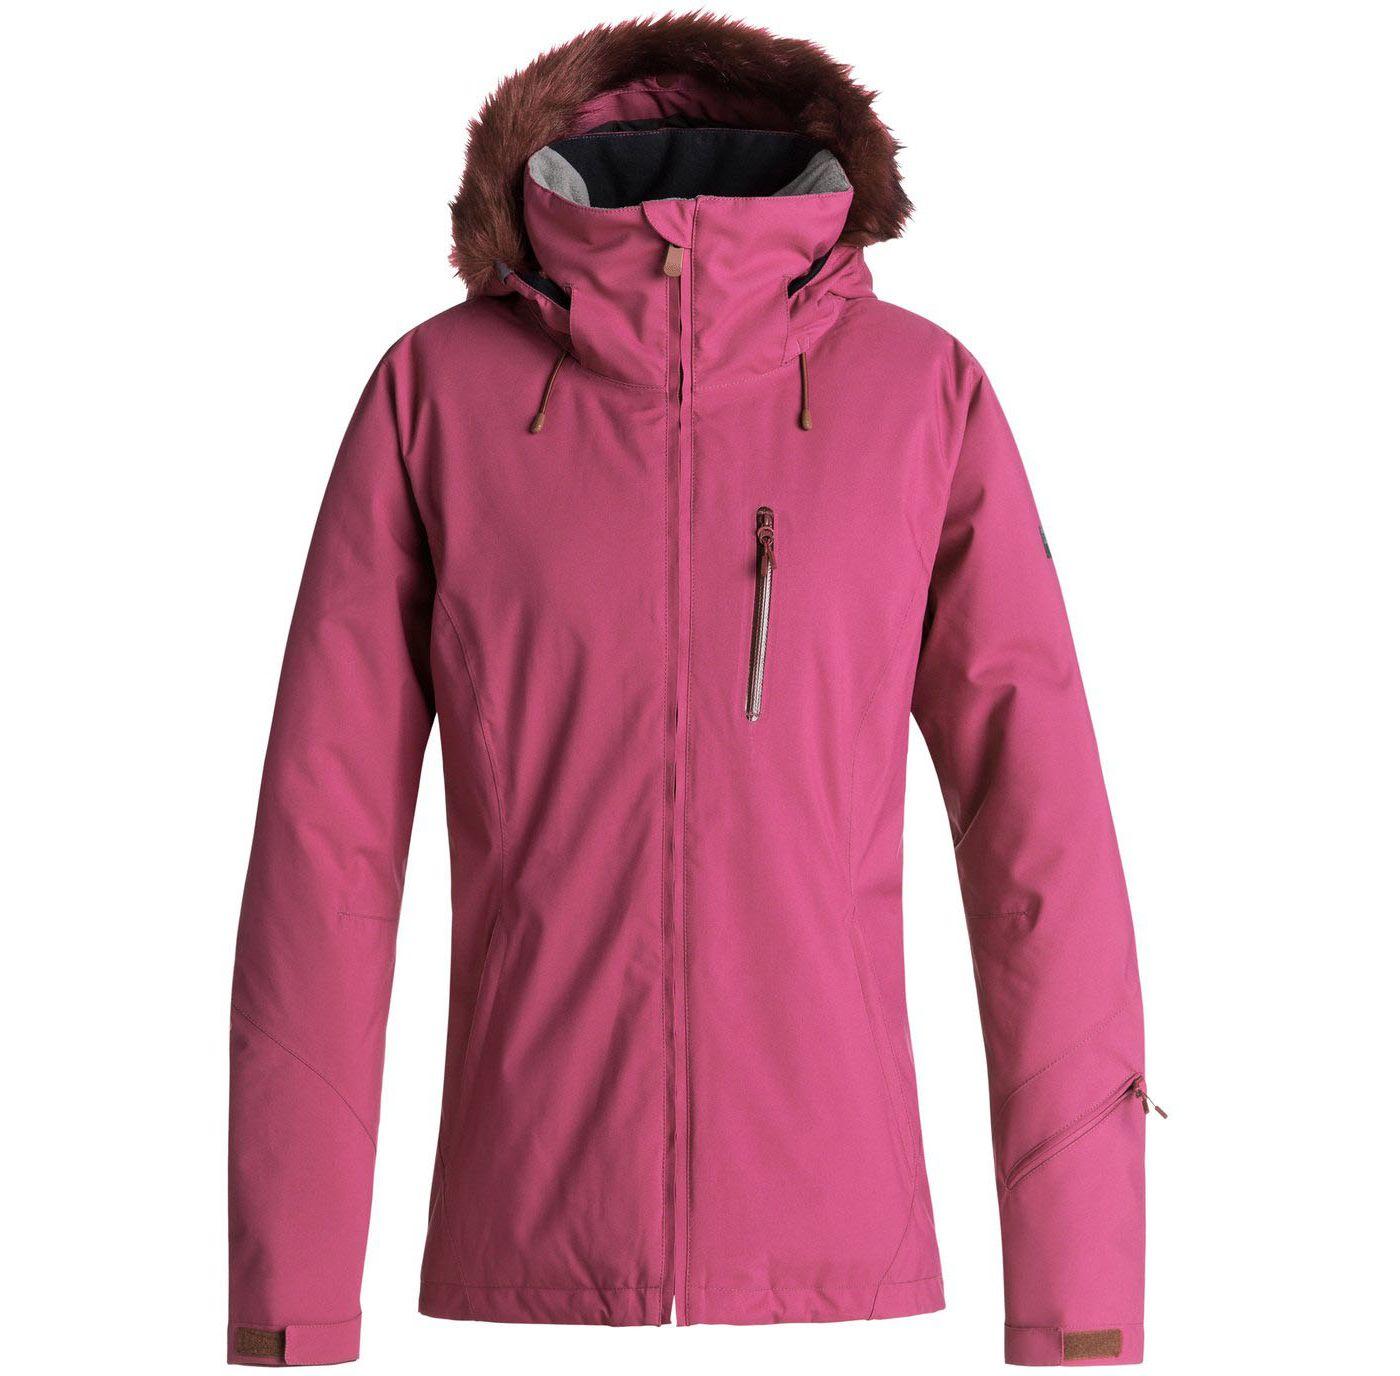 Roxy Women's Down The Line Snow Jacket